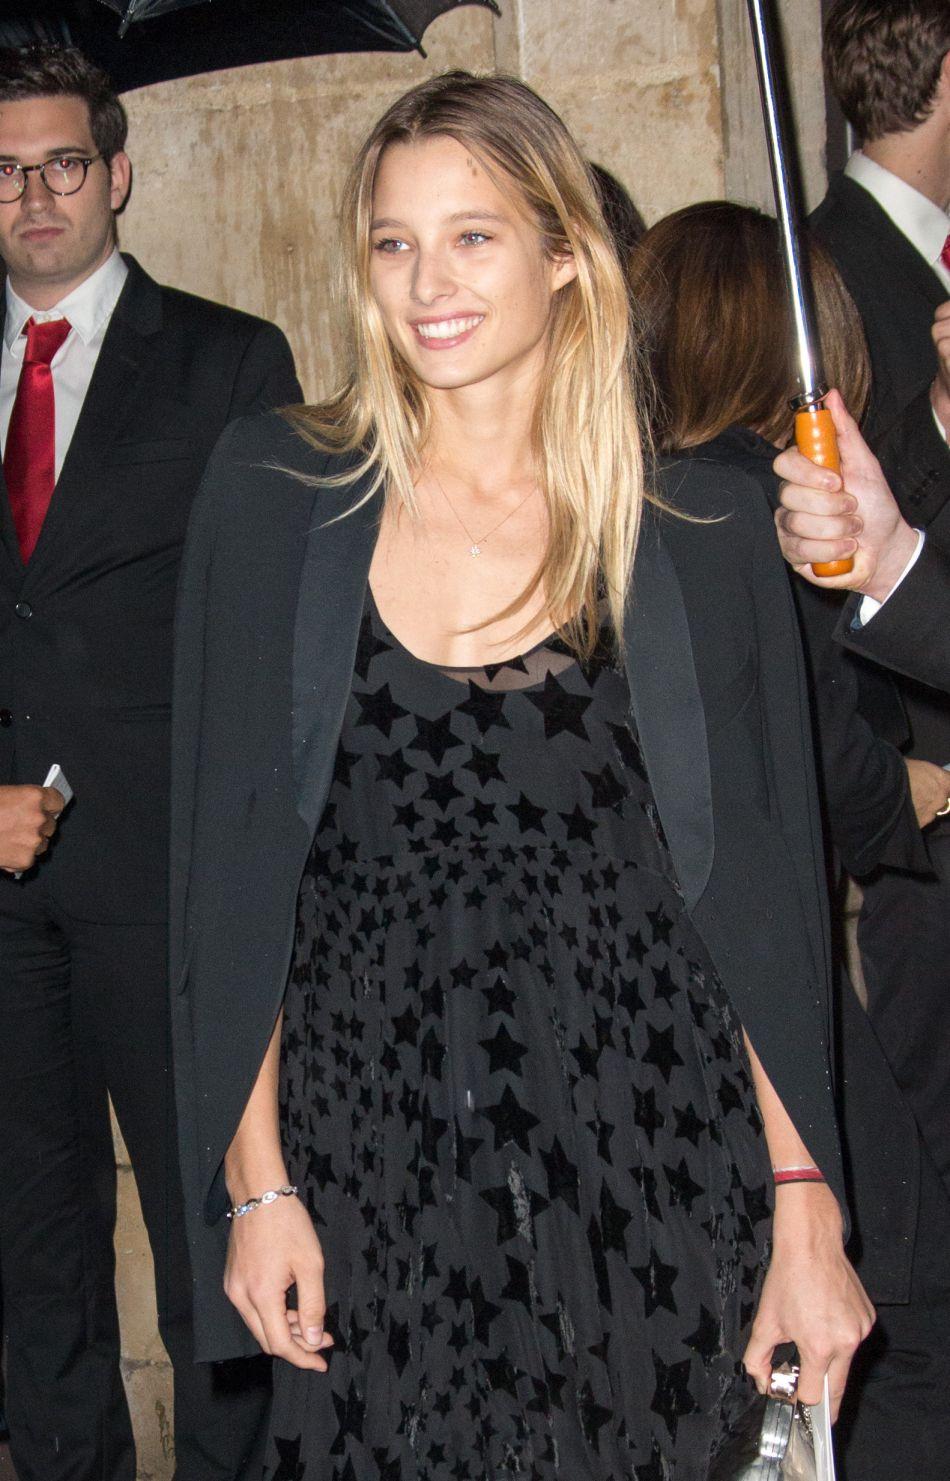 Ilona Smet radieuse pour la Fashion Week parisienne.